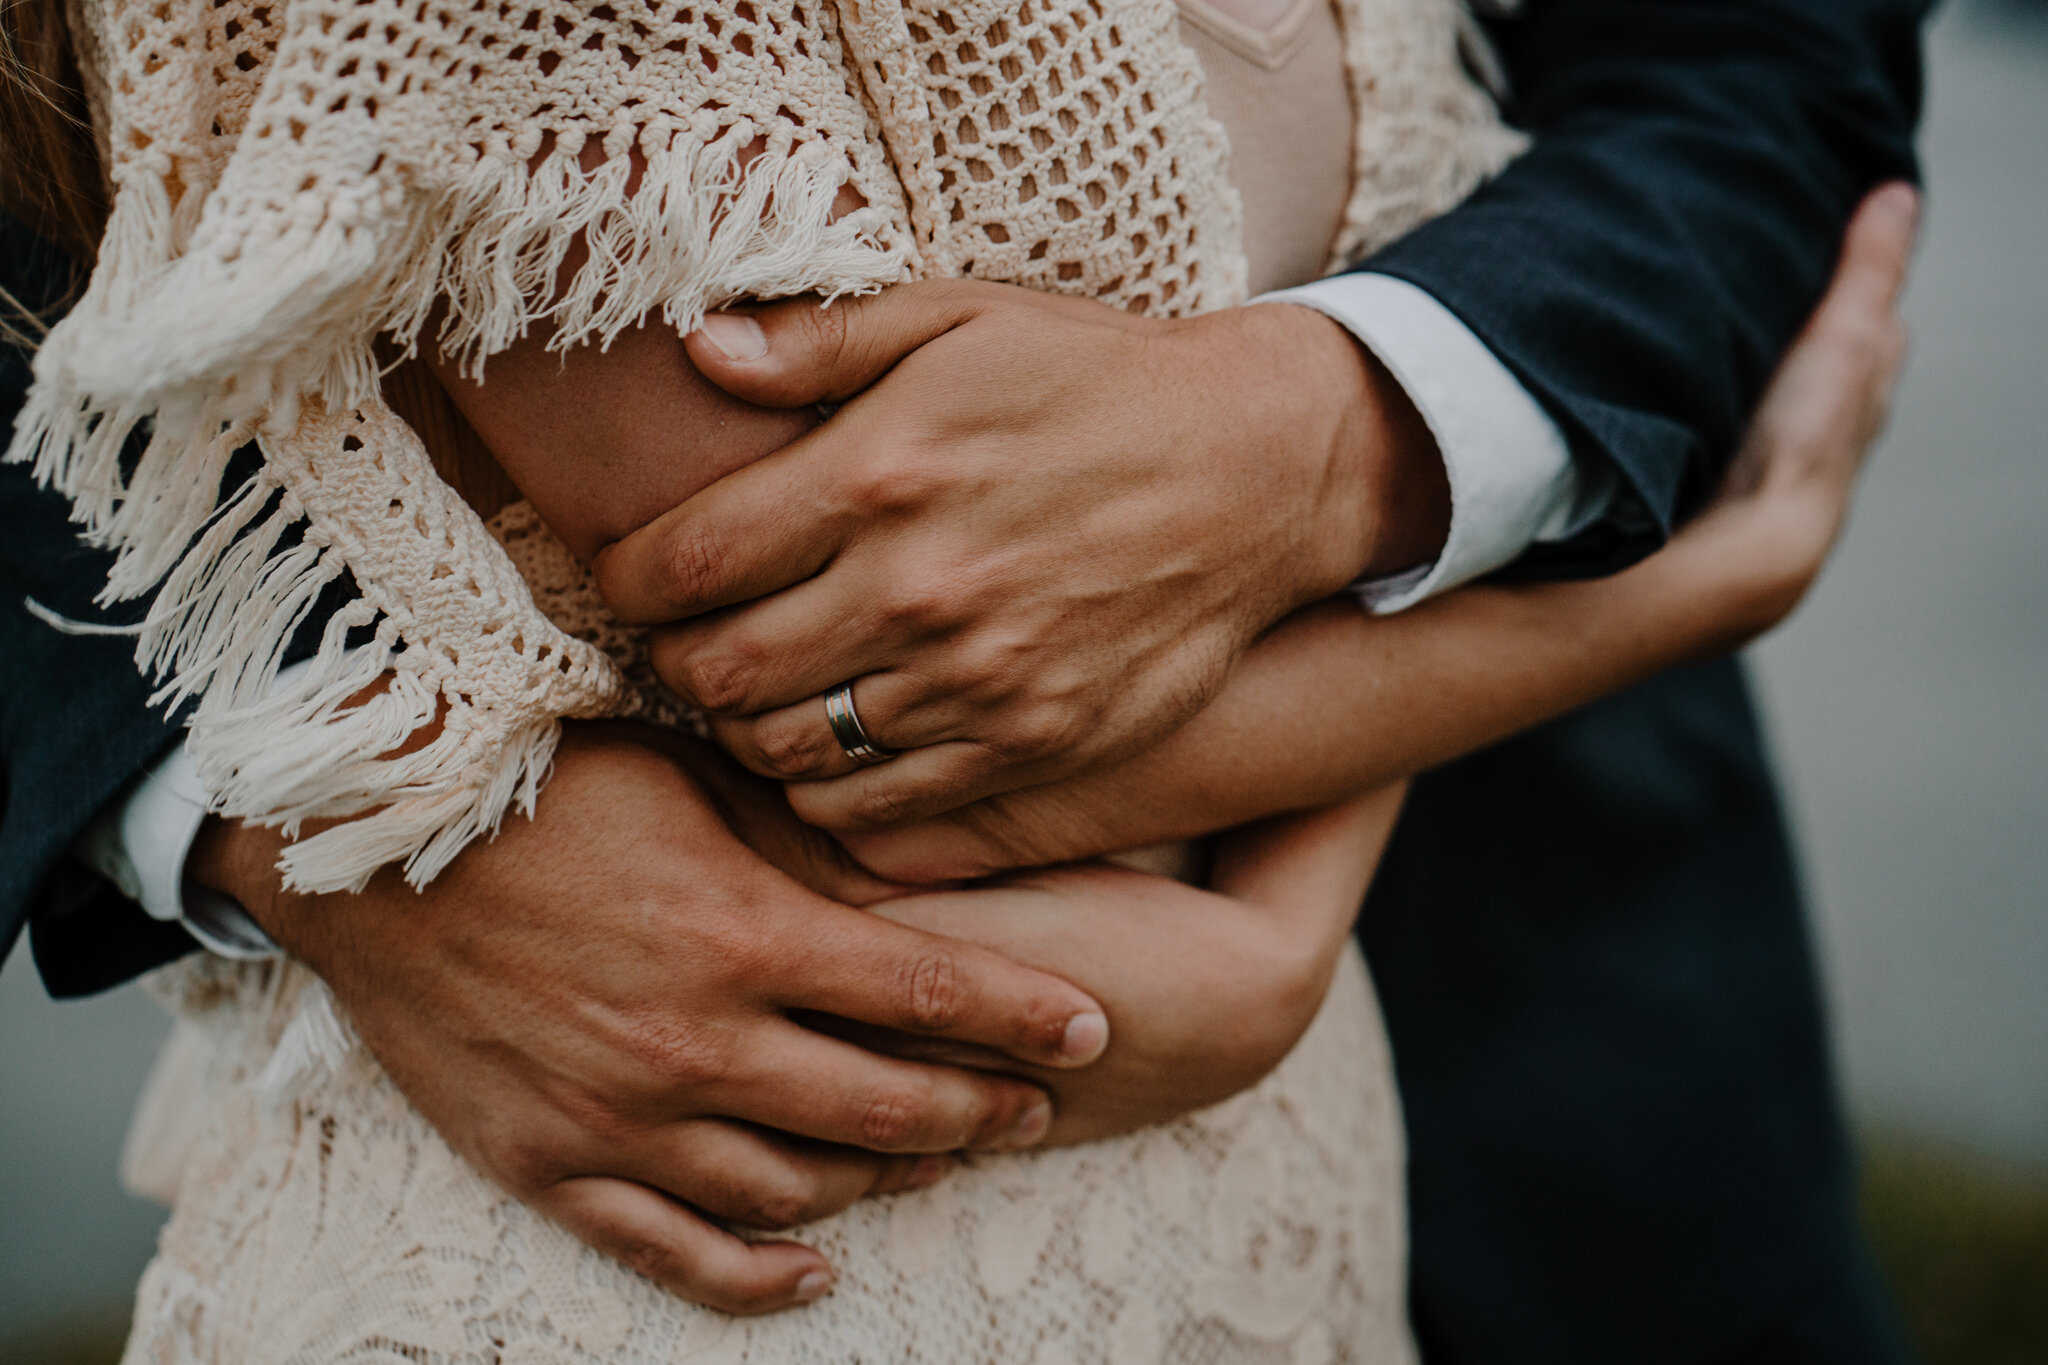 husband wife close up embrace crochet lace wedding dress custom made Cliffs of Moher ireland